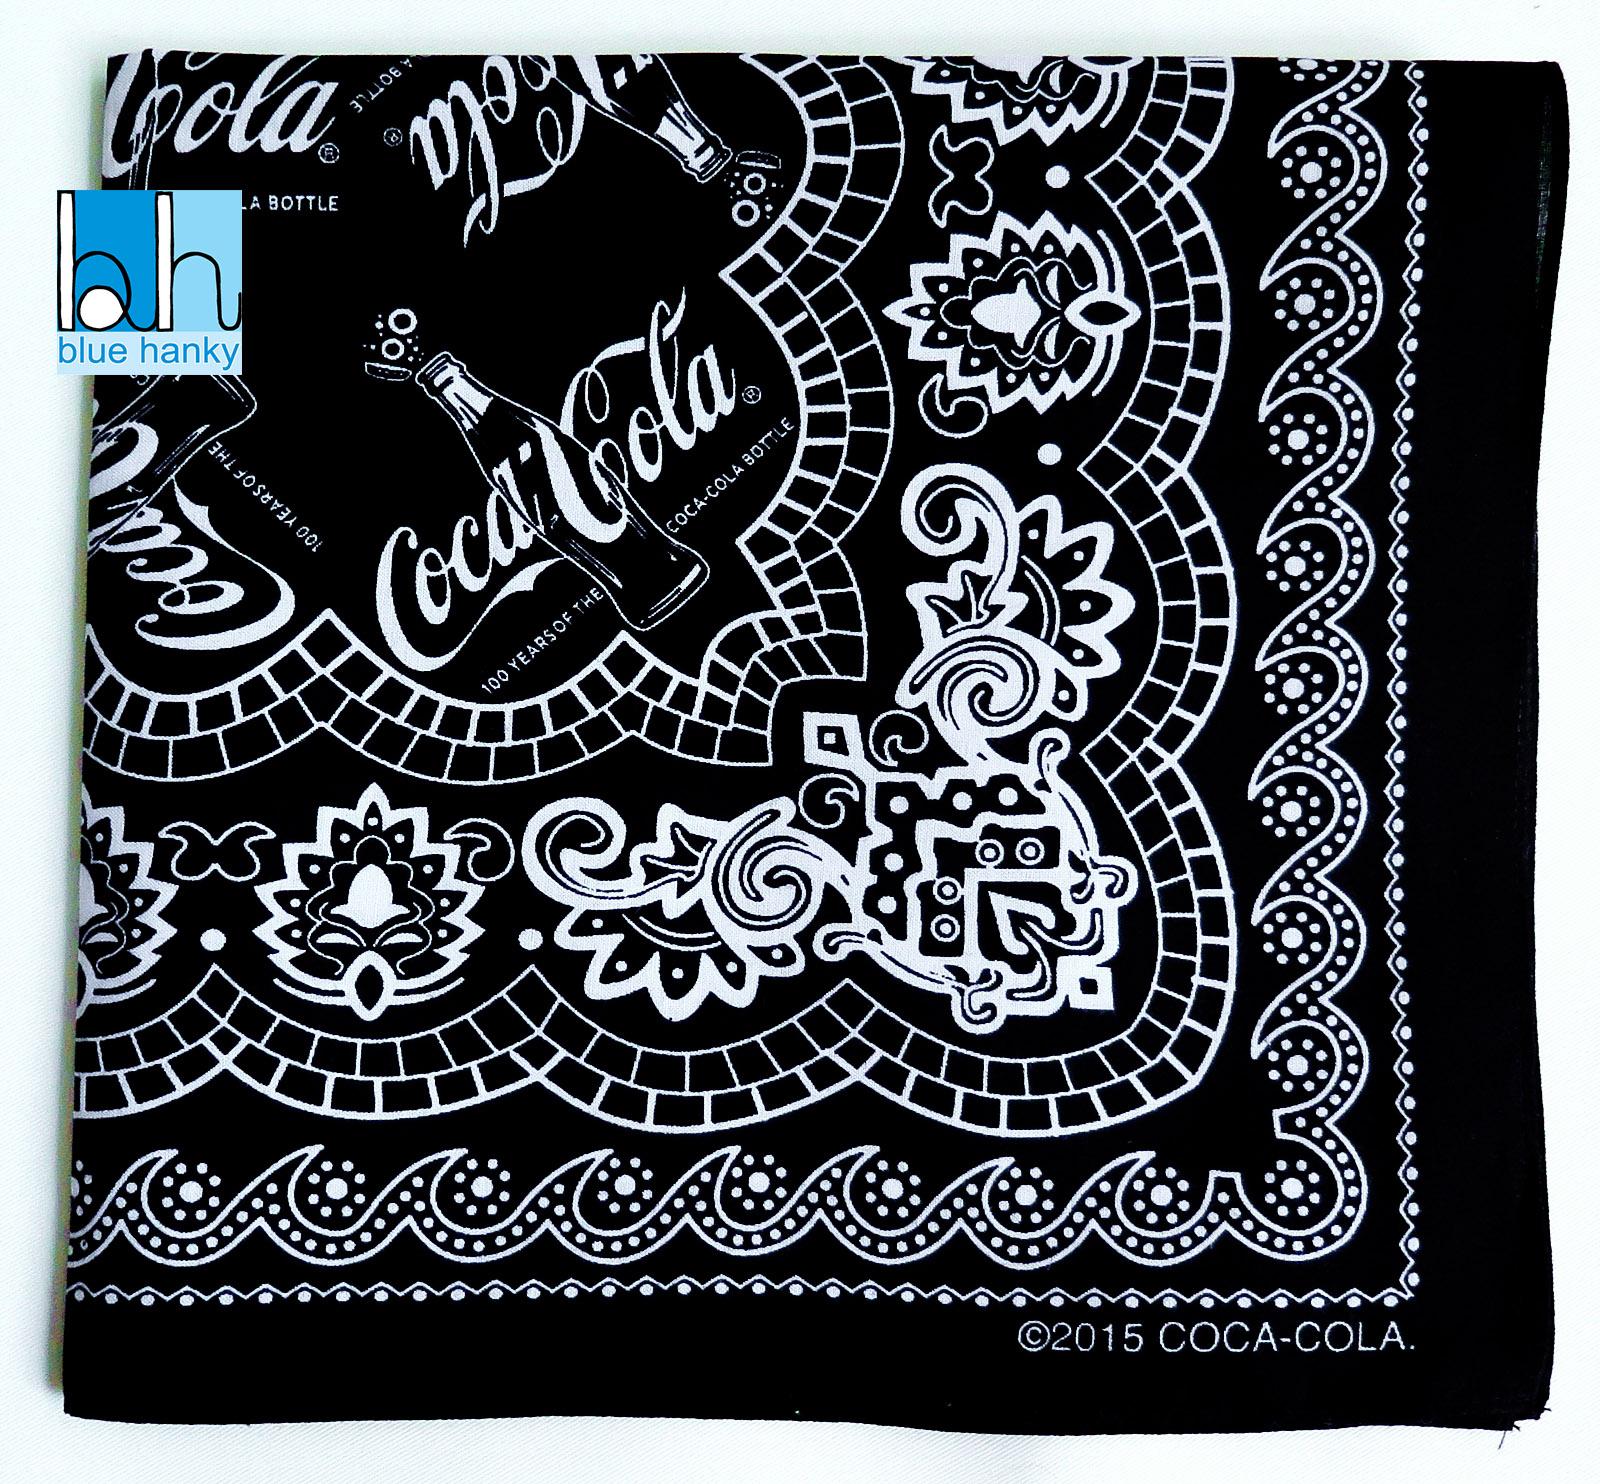 "#267 21"" 100 YEARS OF COCA COLA Paisley คาวบอย ผ้าเช็ดหน้ามือ2 สภาพดี ผ้าเช็ดหน้าผืนใหญ่"